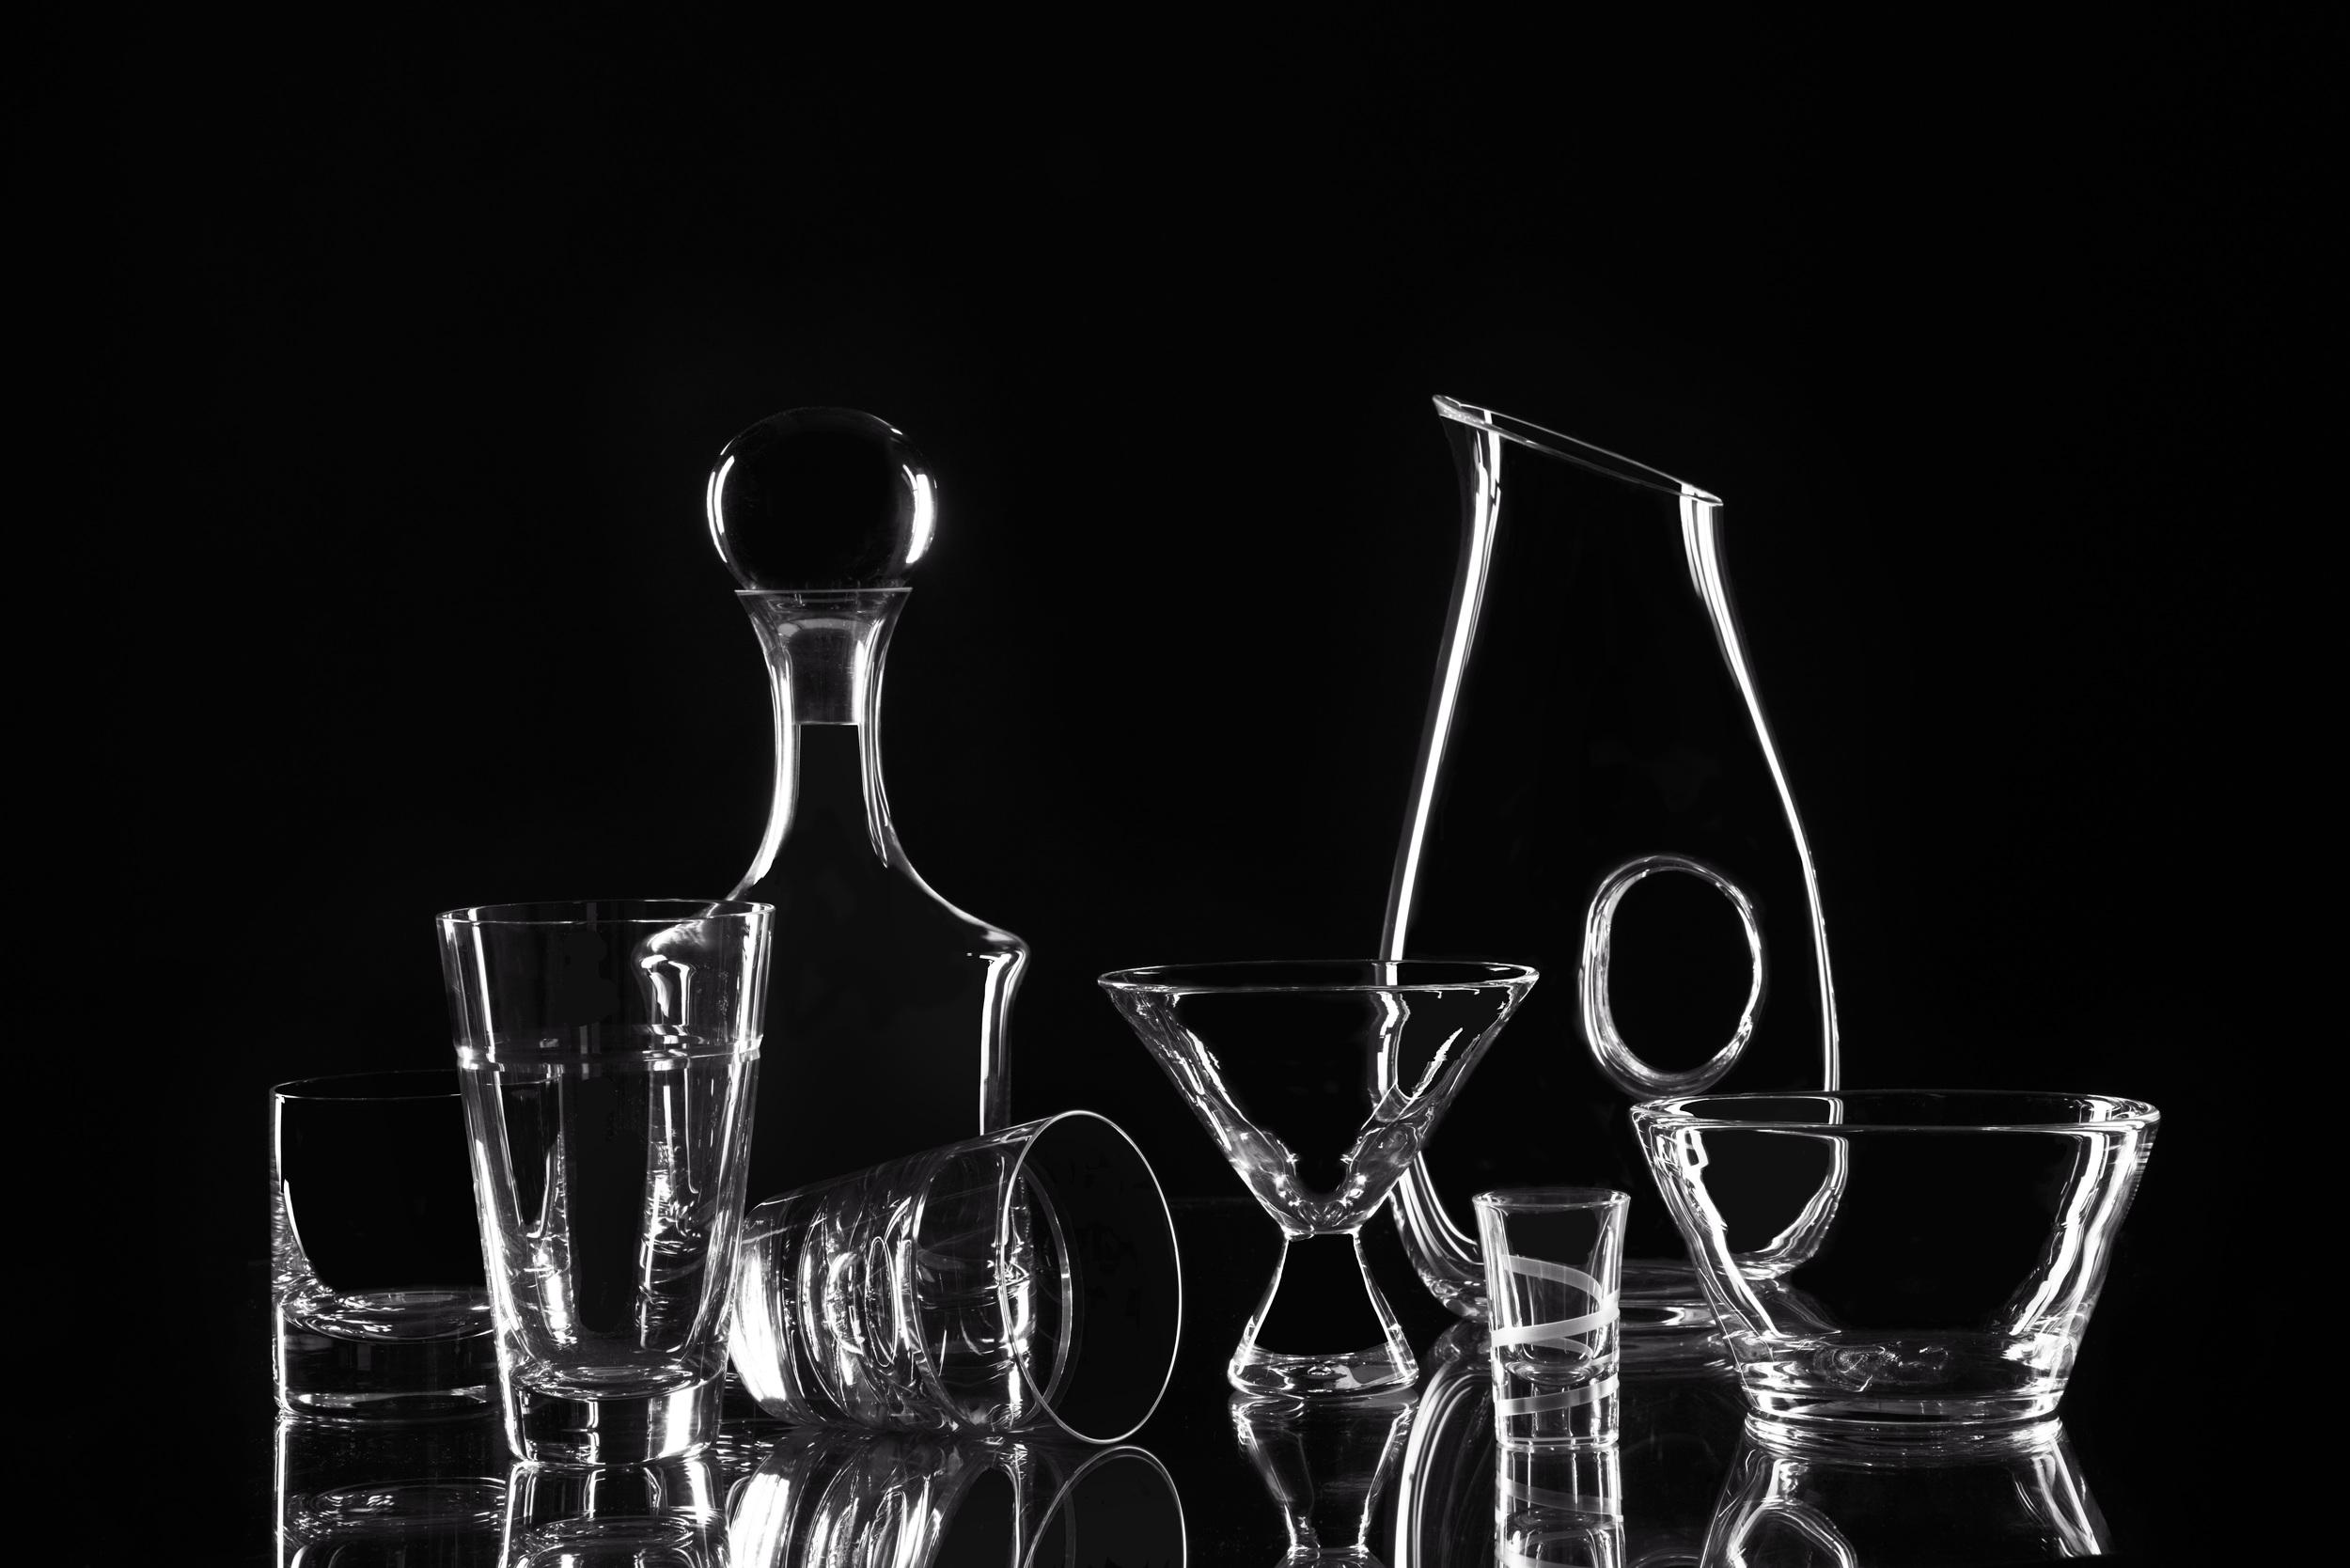 20160511-glassware0644working copy.jpg